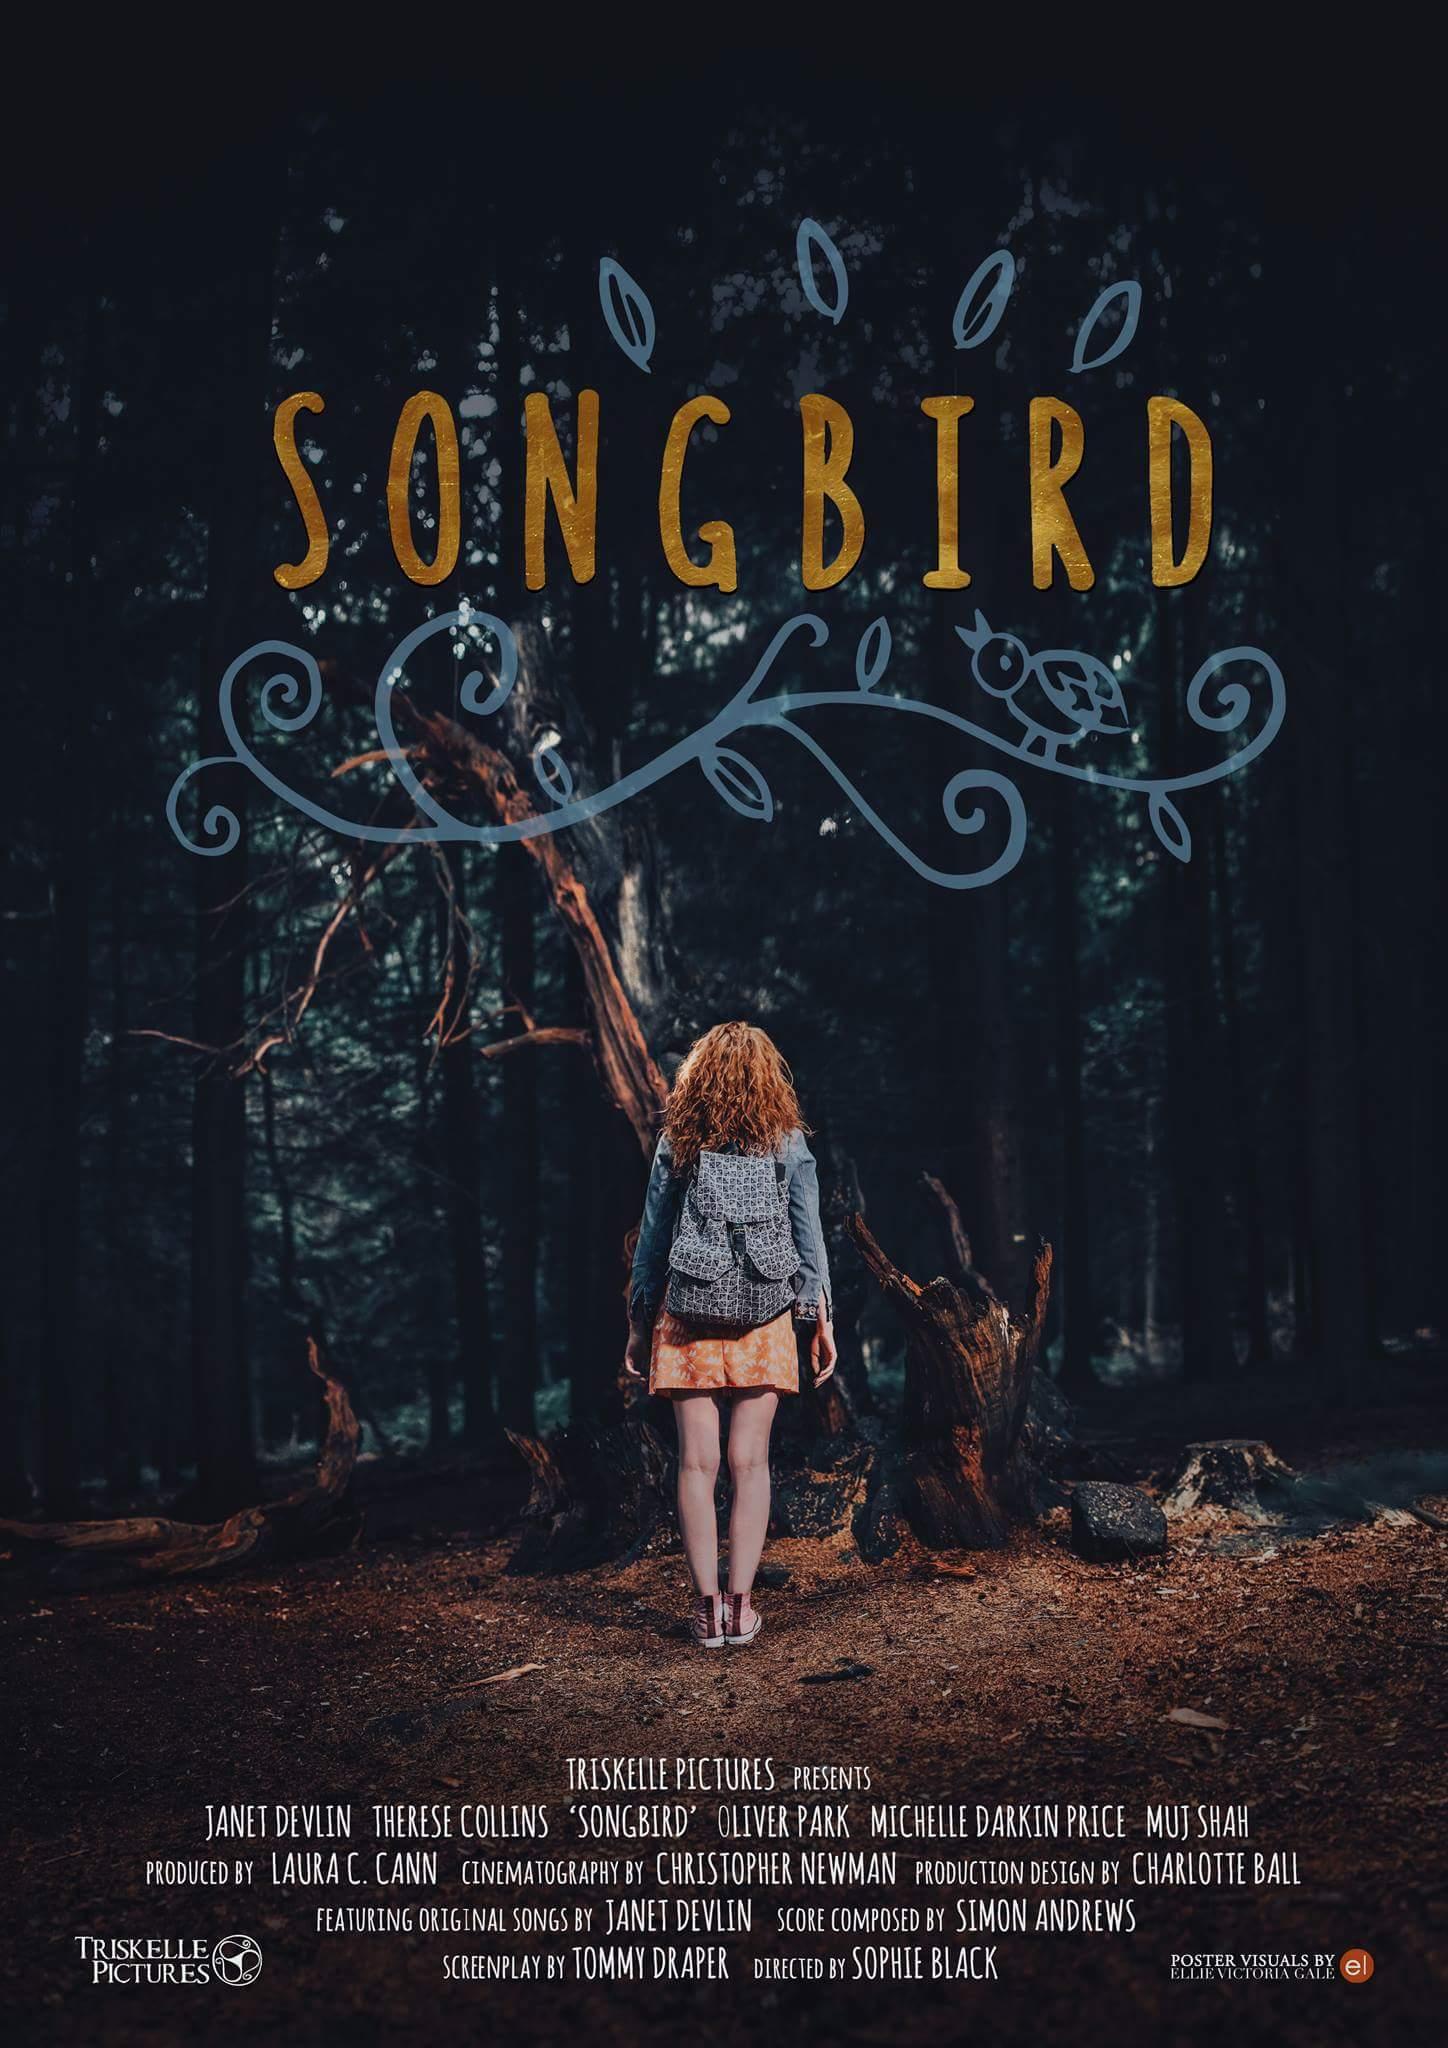 Download Filme Songbird Torrent 2021 Qualidade Hd